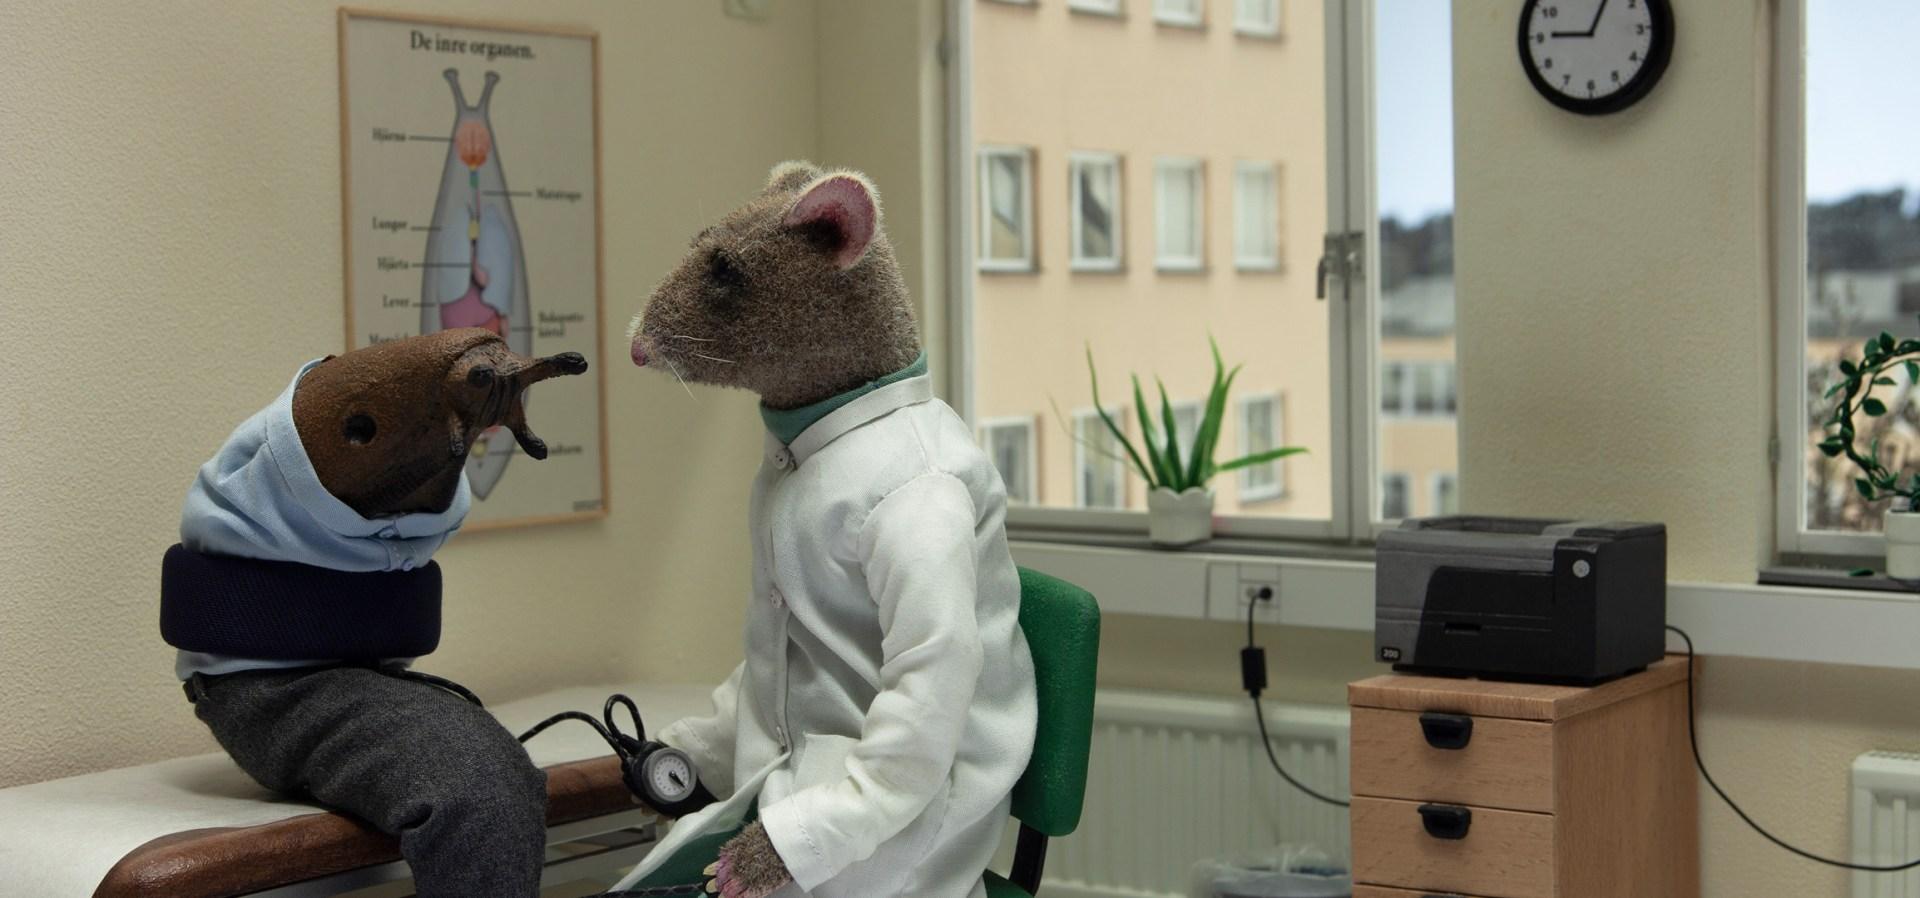 Pictoplasma 2020 - Animation Direktor Niki Lindroth von Bahr